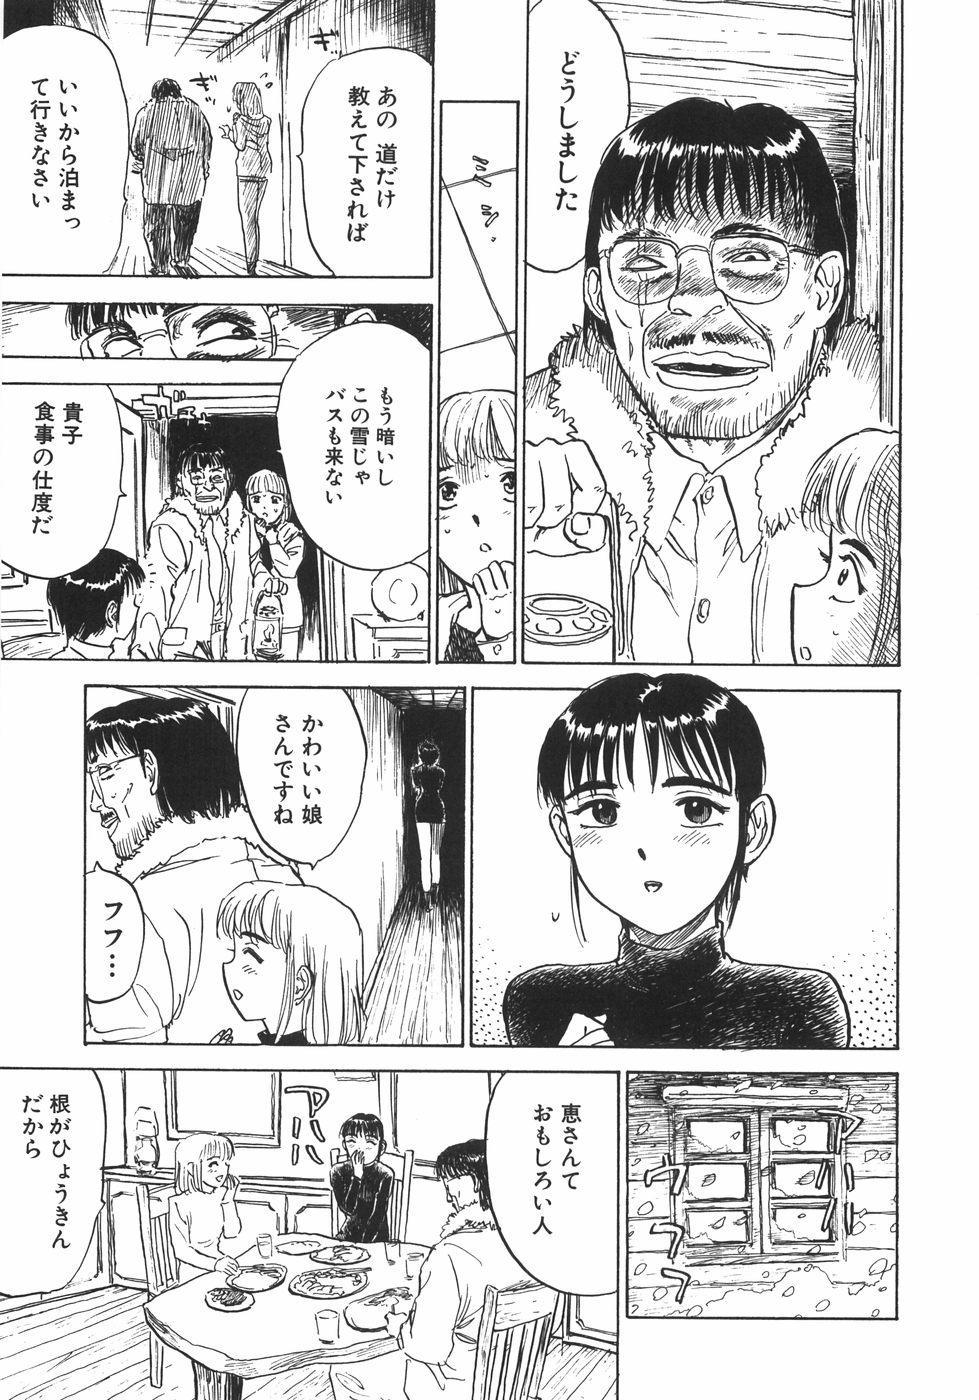 Ningyou no Yakata - The Doll House 11